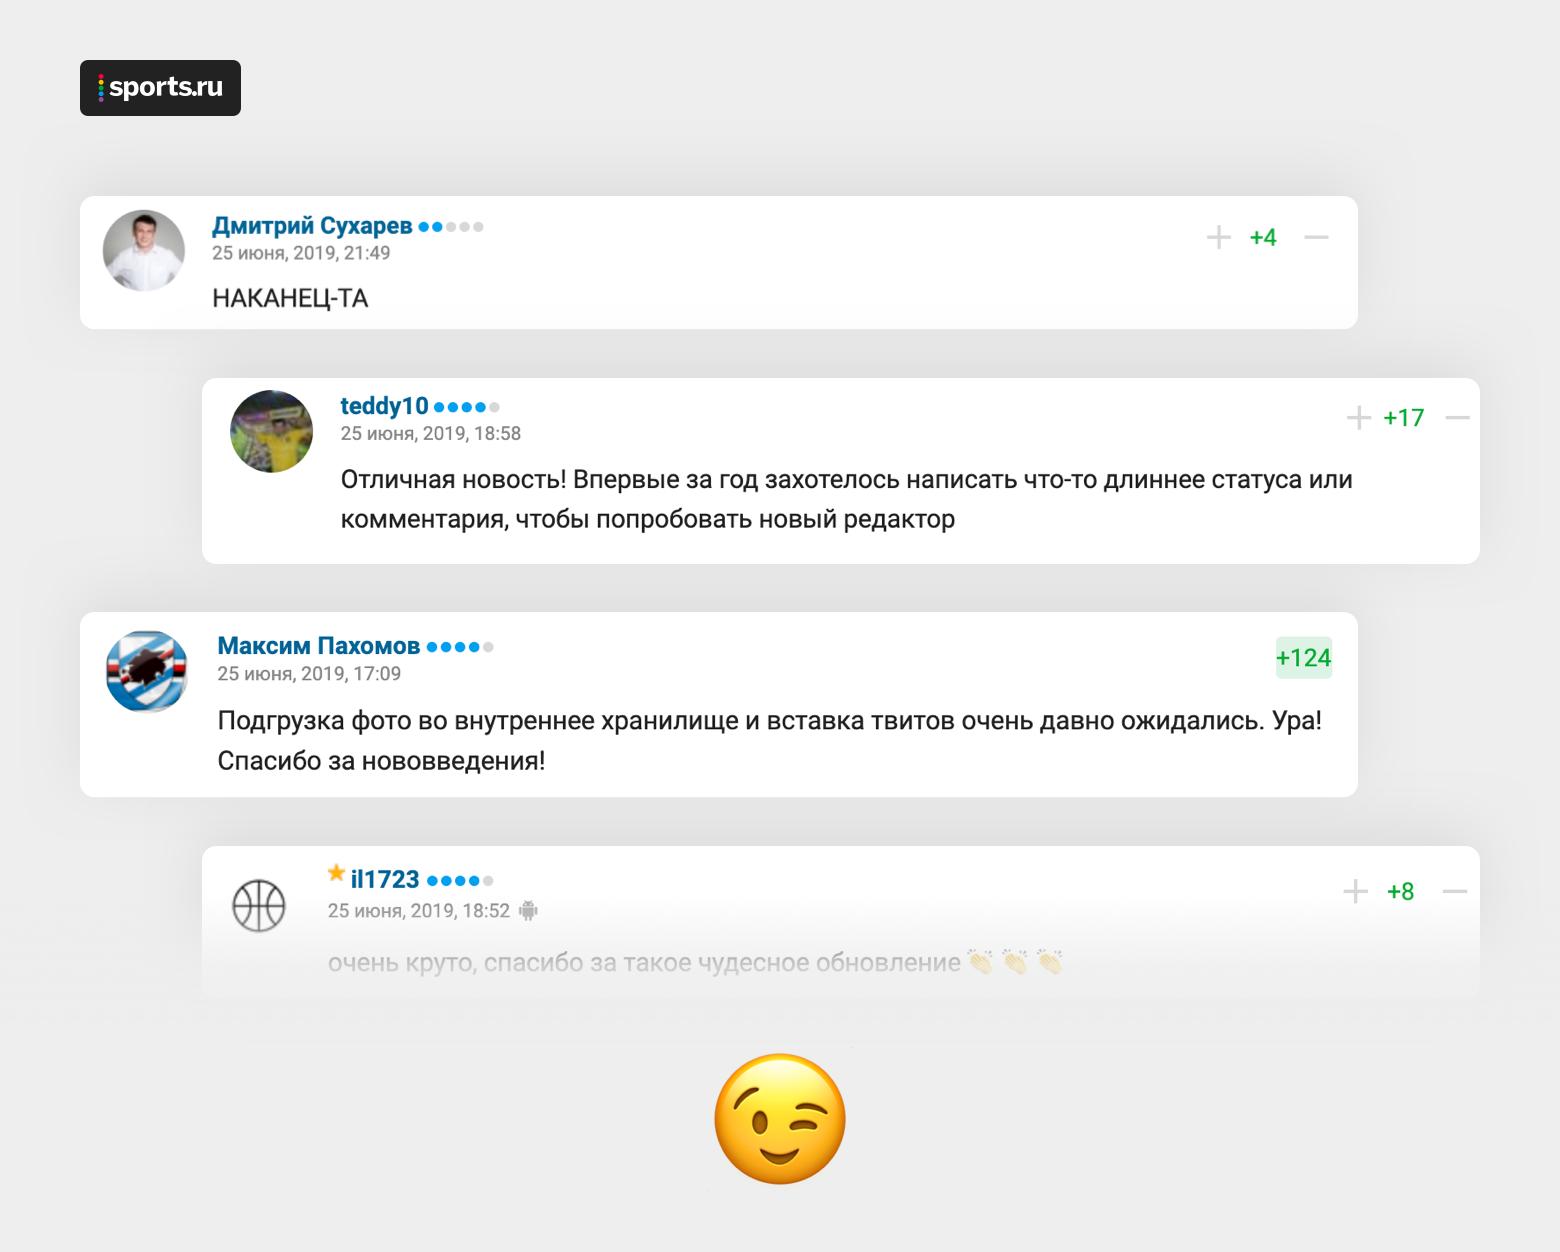 Как в Sports.ru писали свой WYSIWYG-редактор - 6